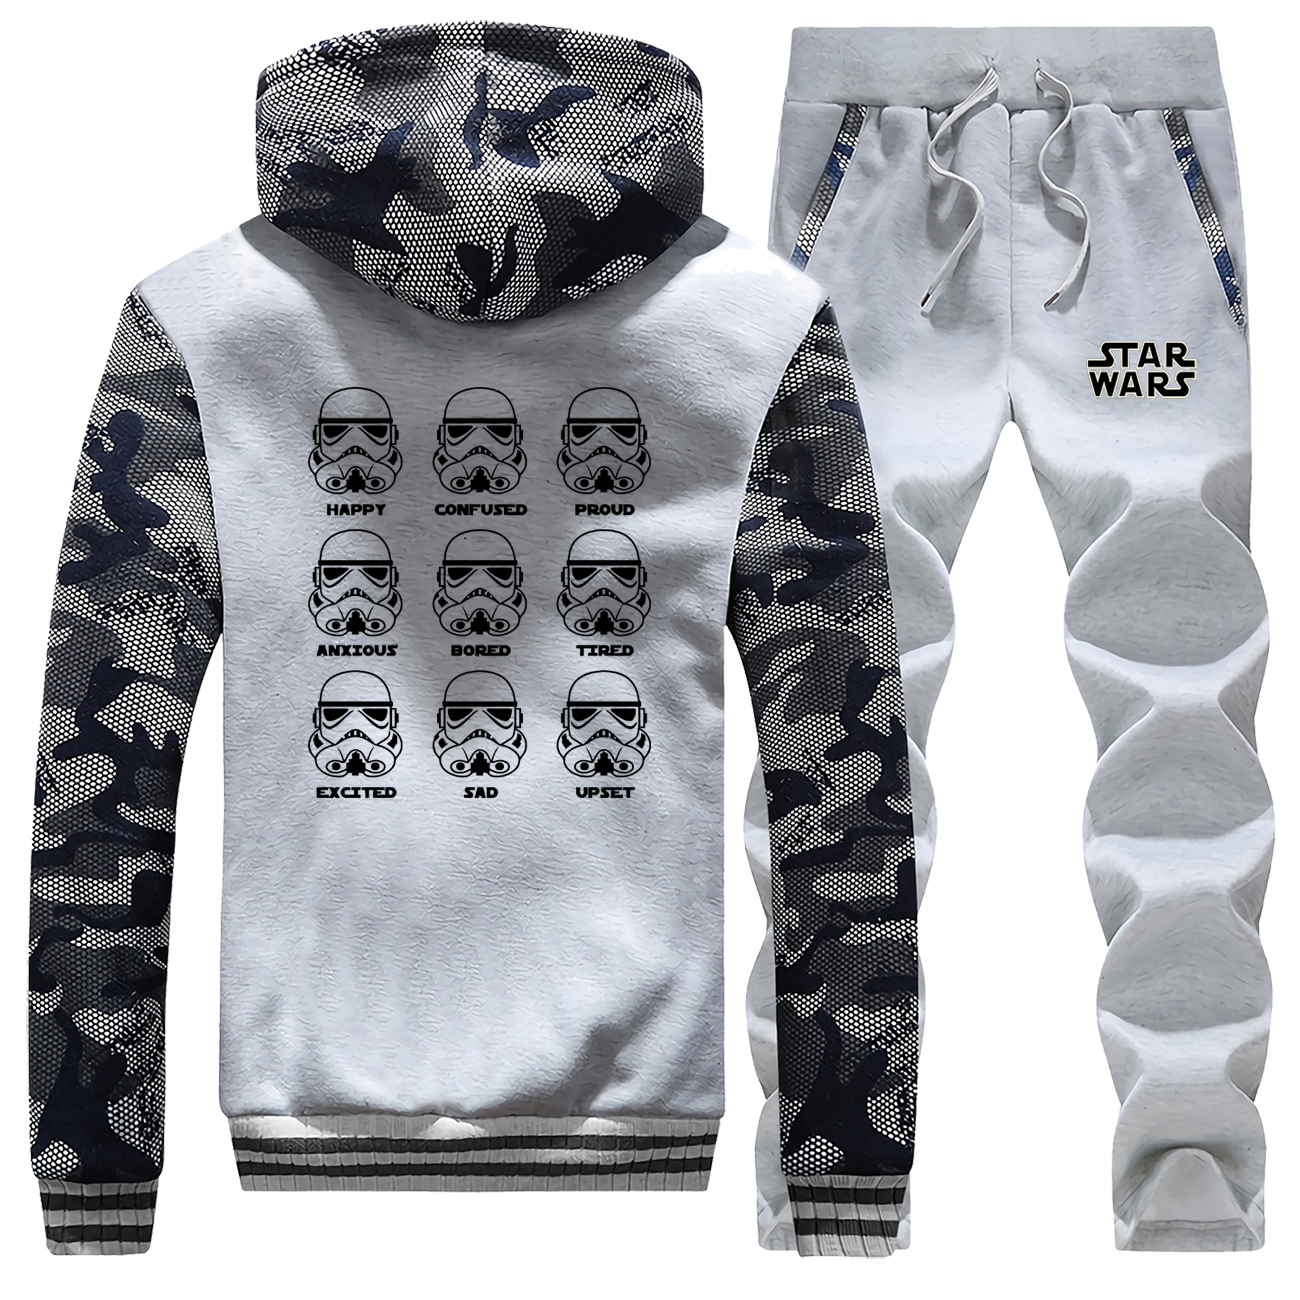 Star Wars Winter Men Hoodie Sweatshirts+Trousers Suit Hip Hop Funny Print Hoodies Mens Jacket+Pants 2 Piece Sets Warm Coat Sets